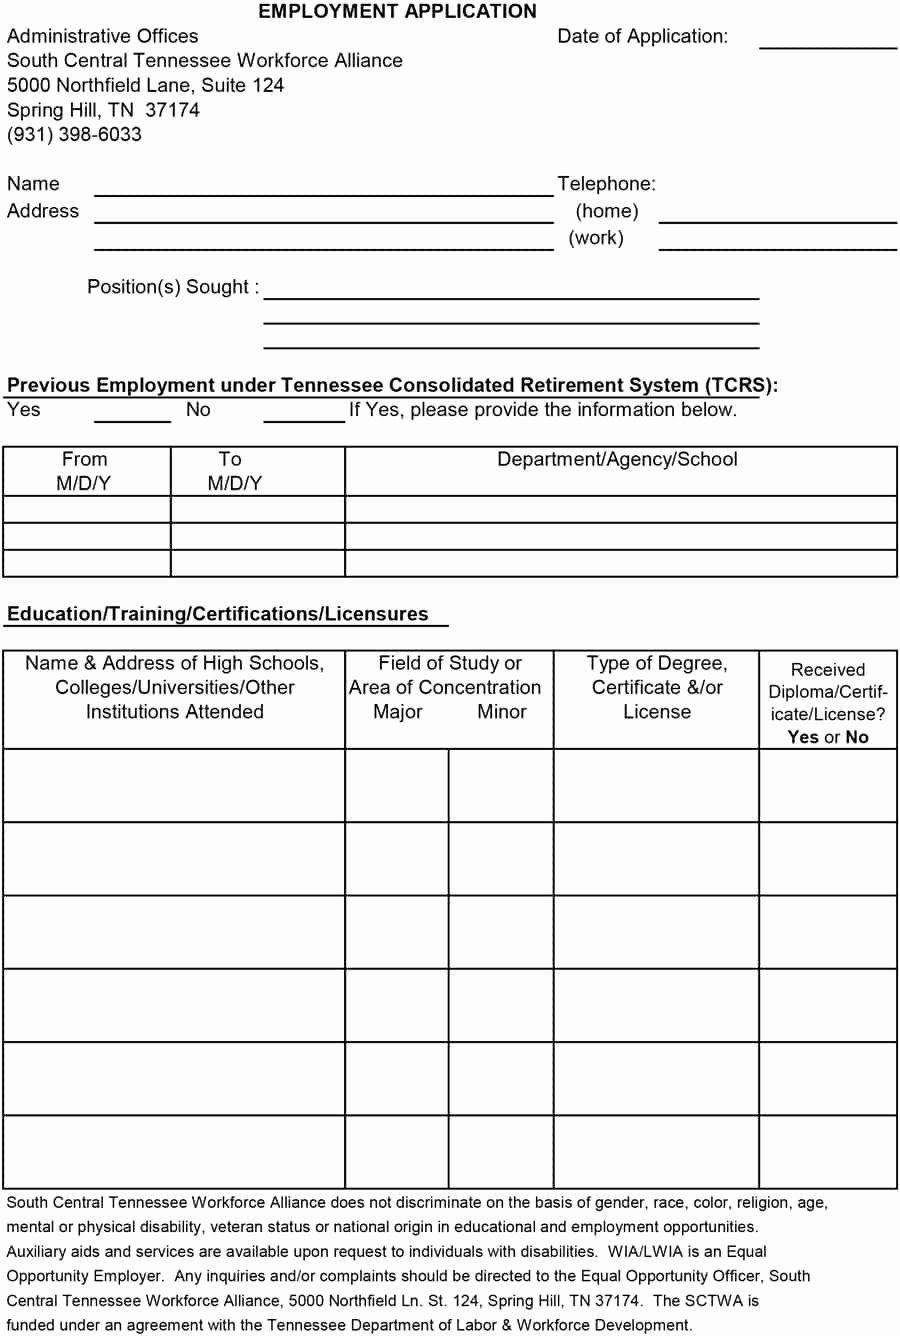 Employment Physical form Template Unique 50 Free Employment Job Application form Templates